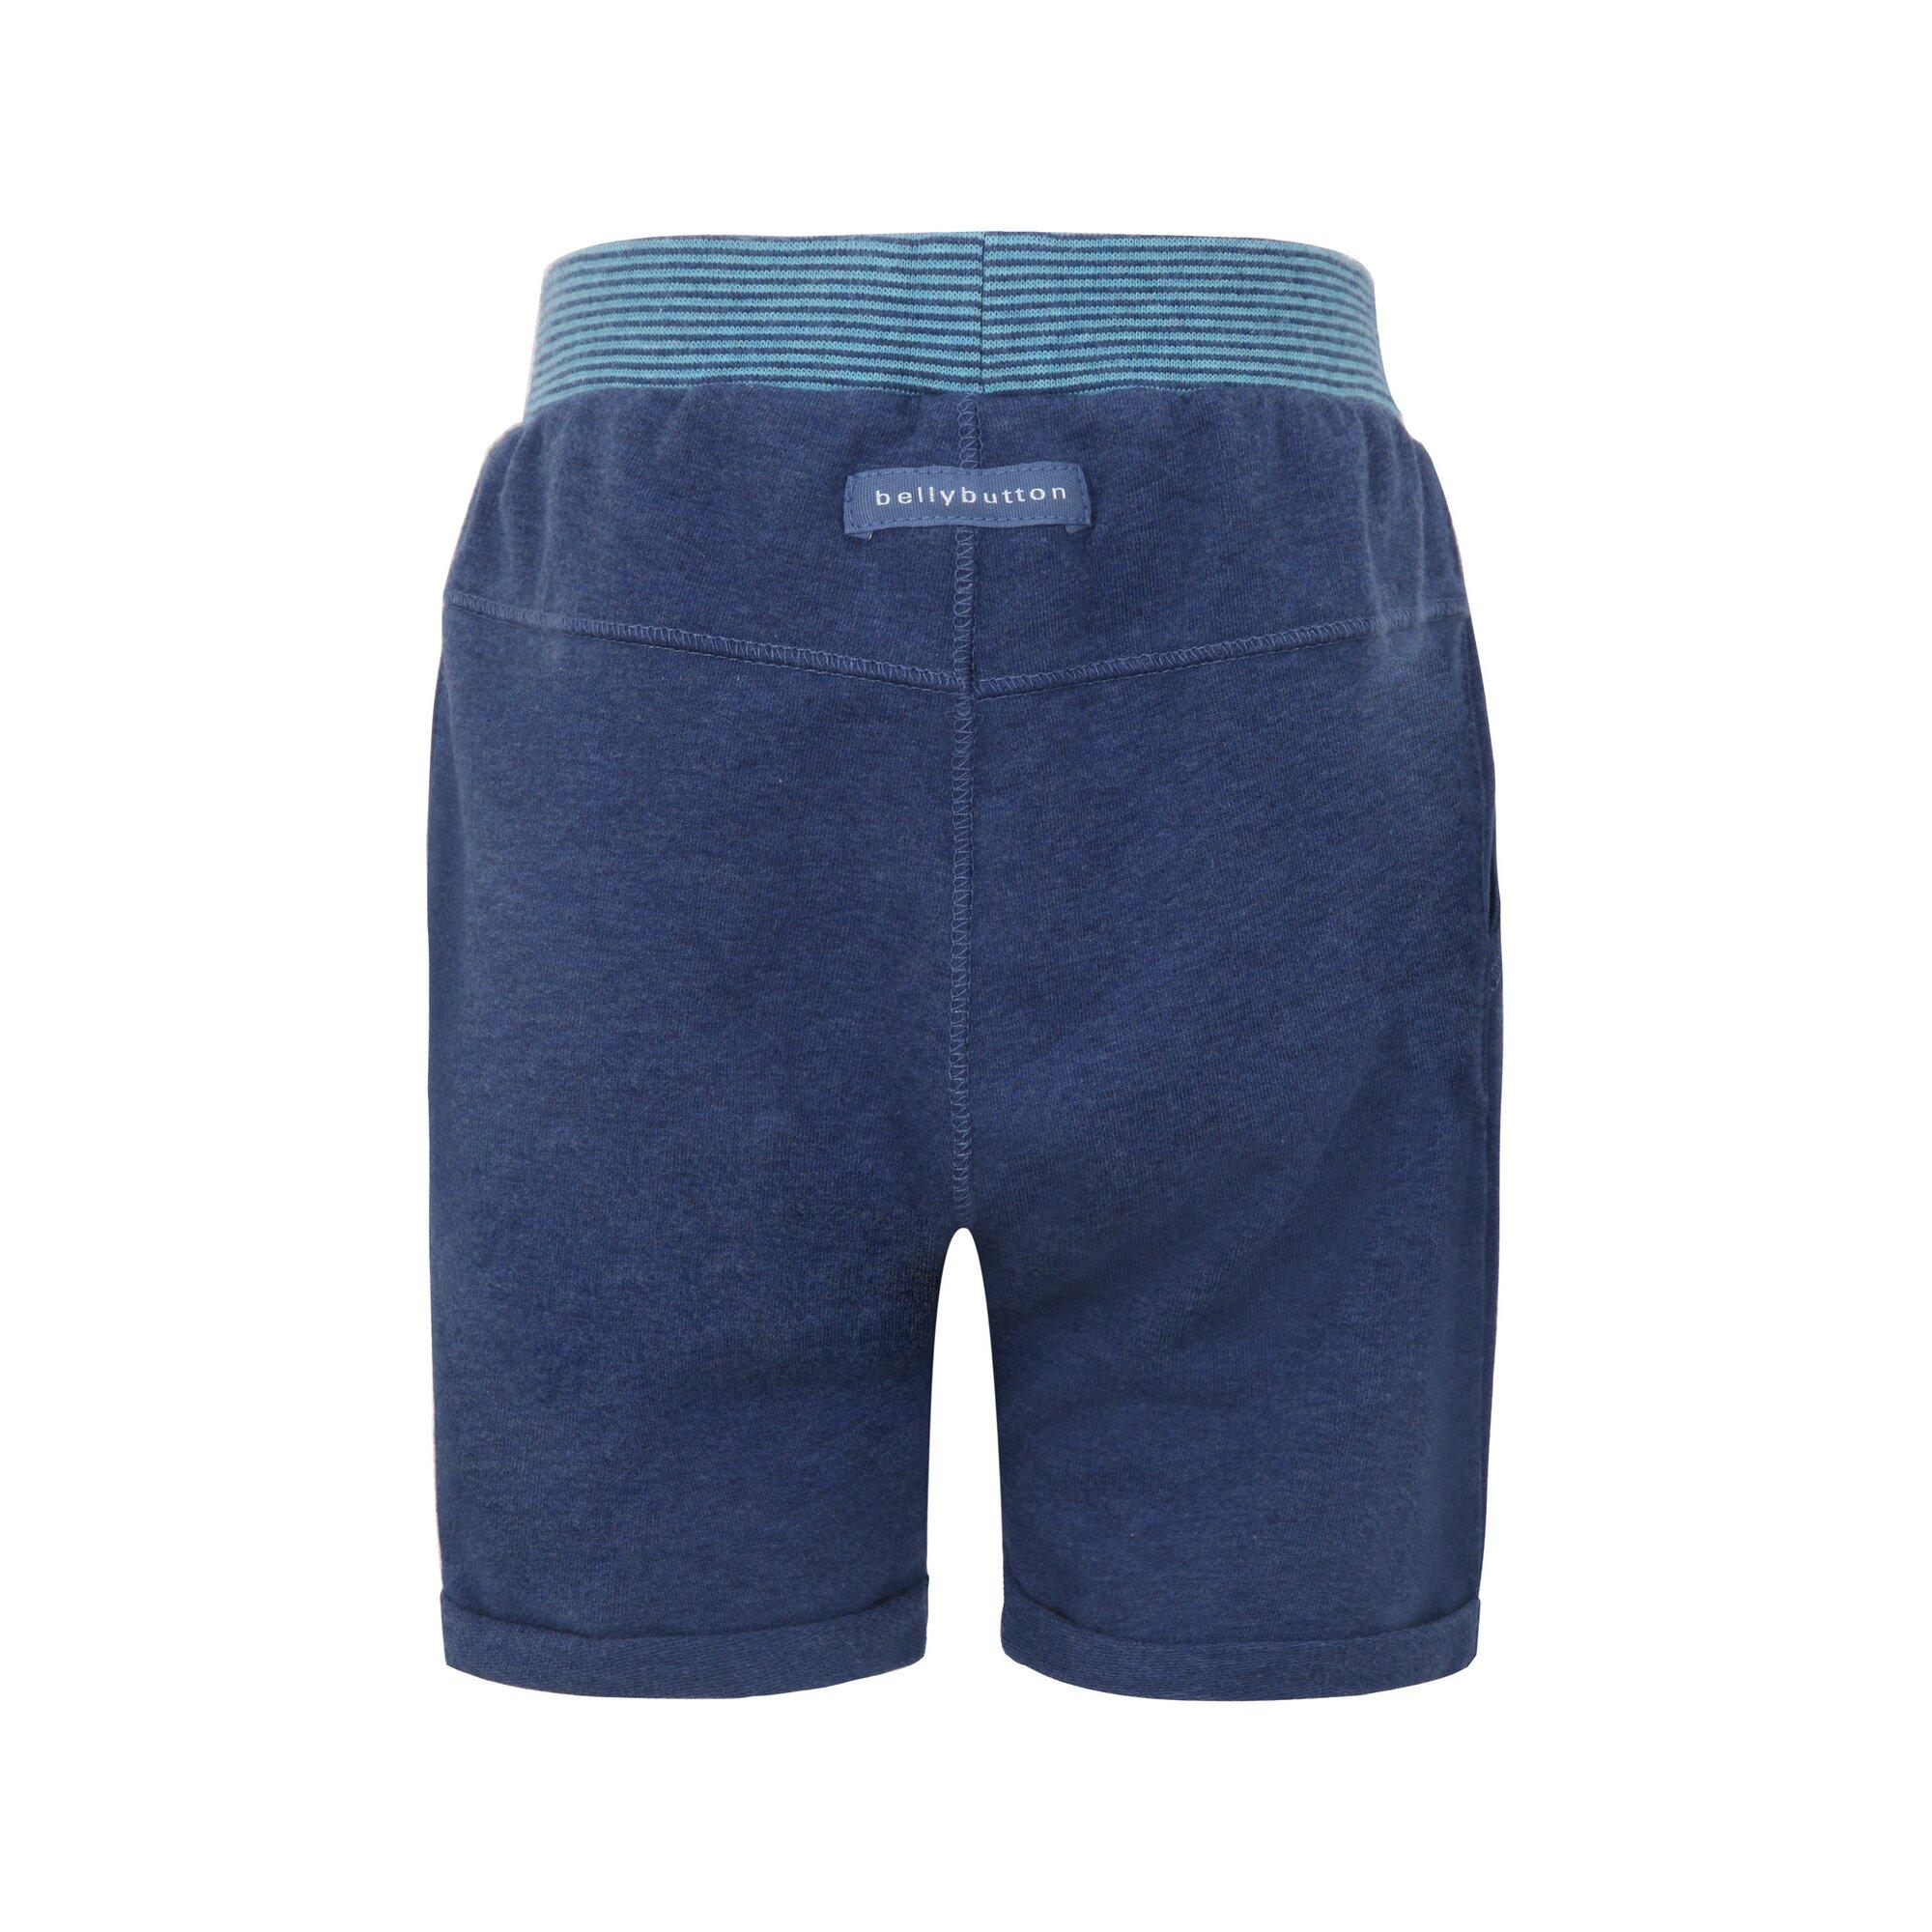 bellybutton-shorts, 19.95 EUR @ babywalz-de